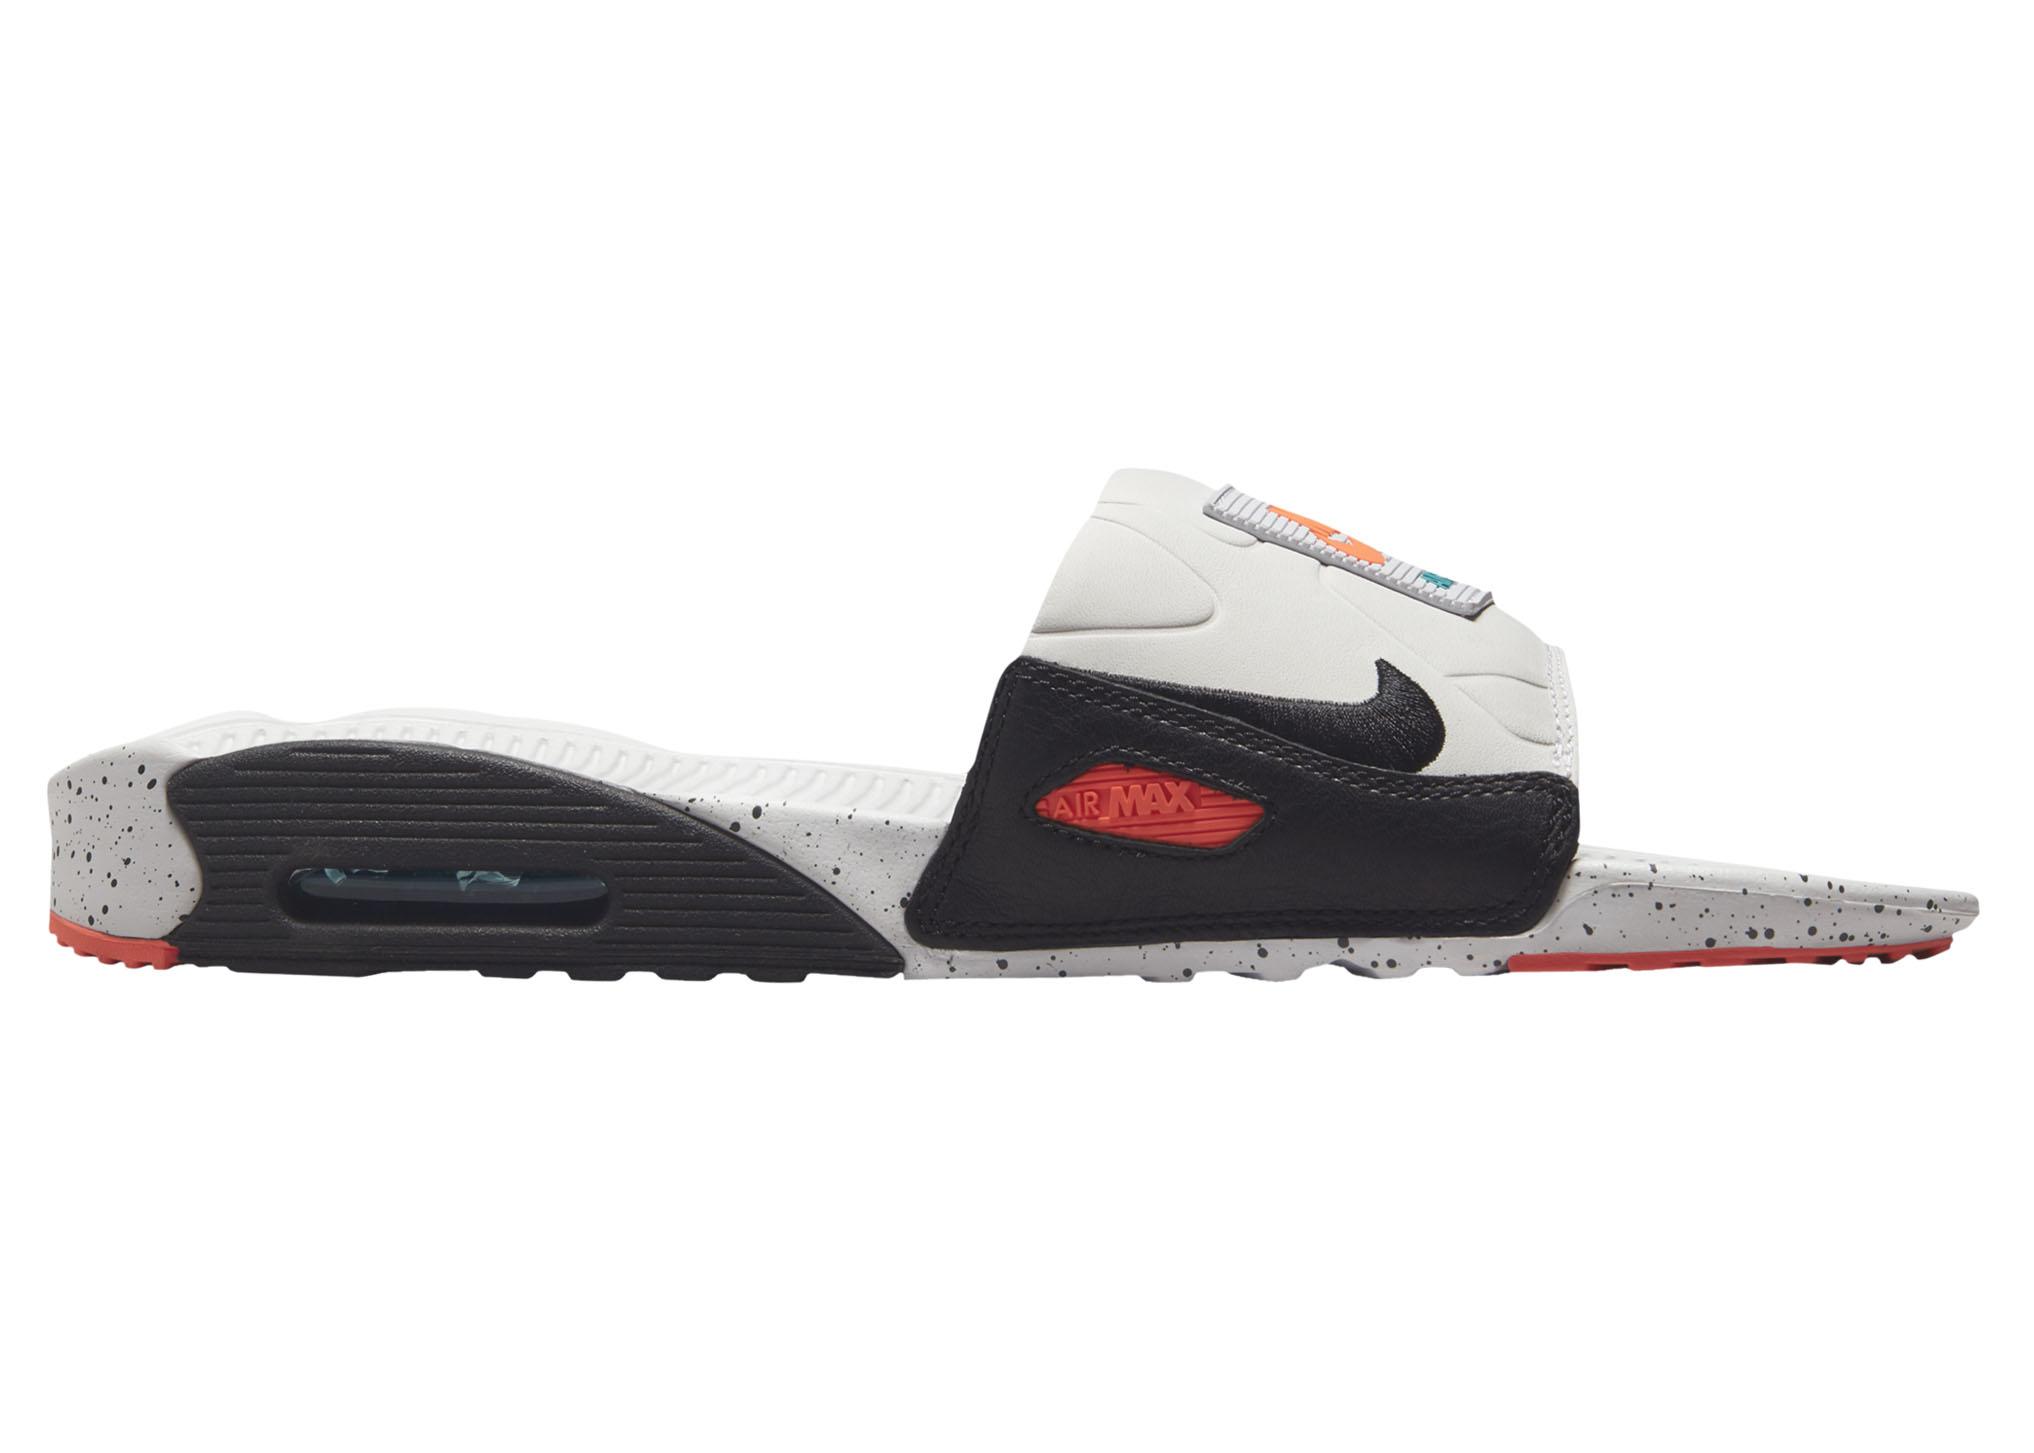 Nike Air Max 90 Slide White Turf Orange Speckled